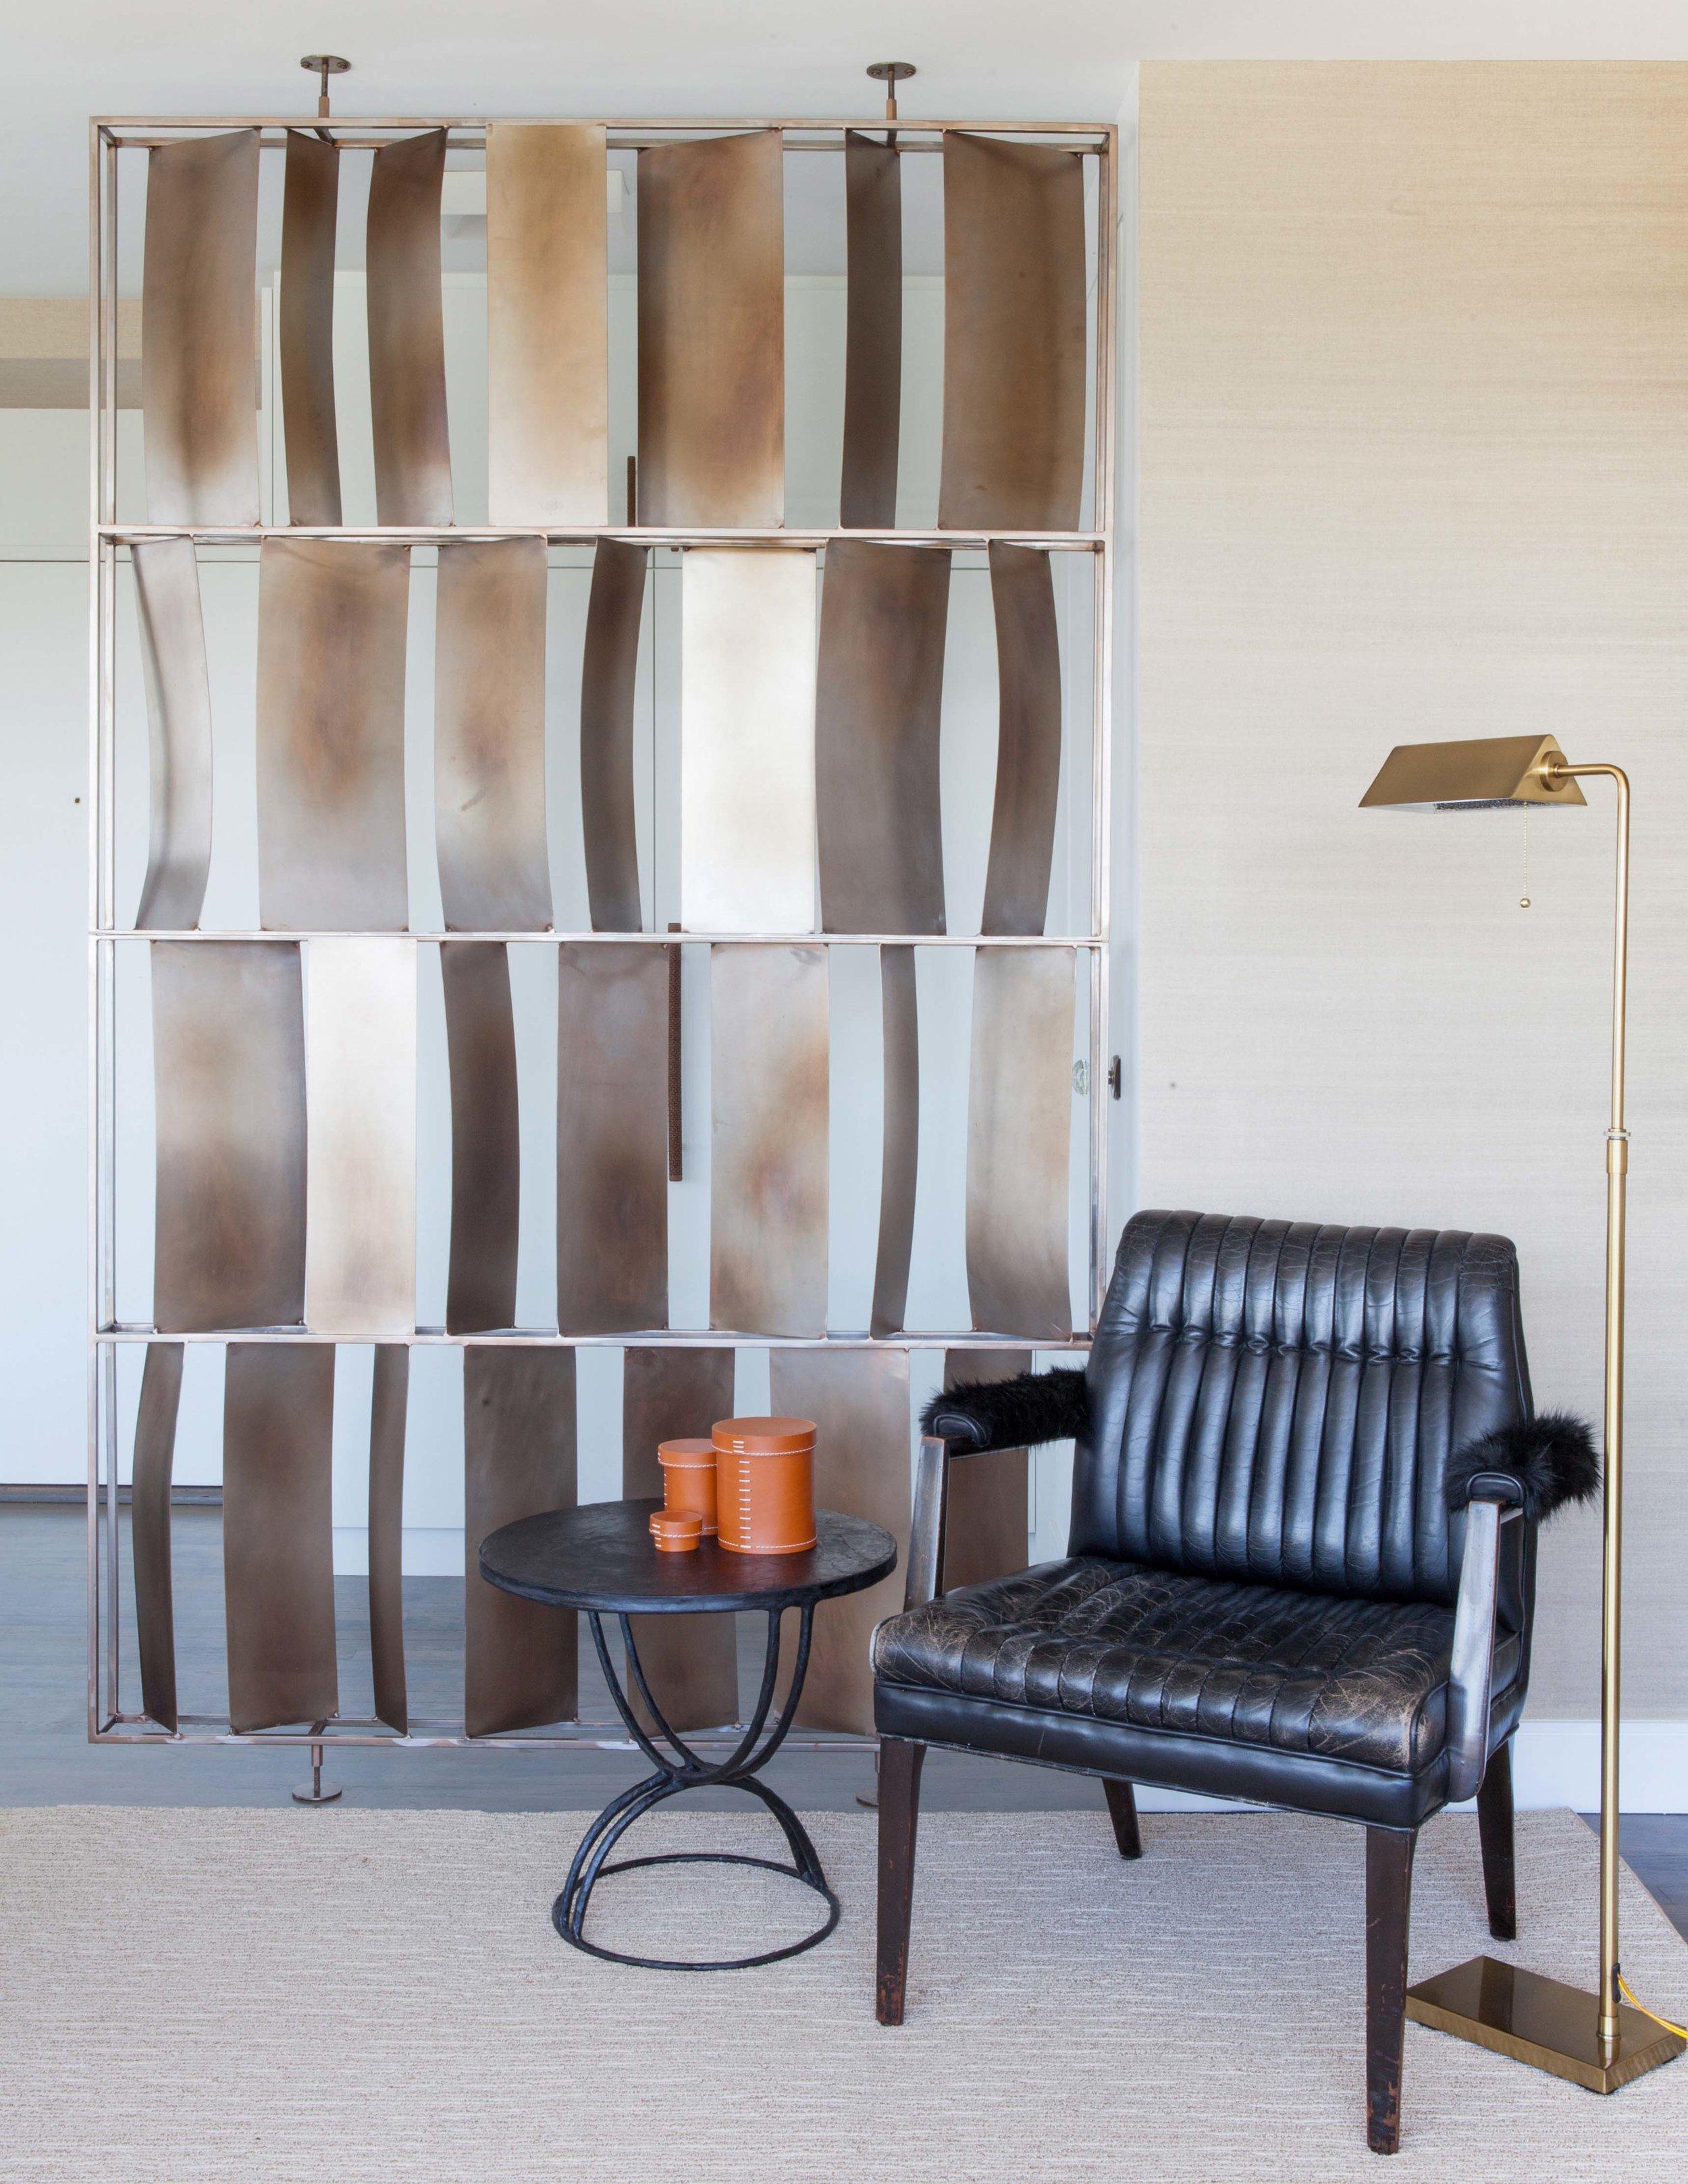 Jamie Pryde Interior Design Hycroft Towers-9.jpg